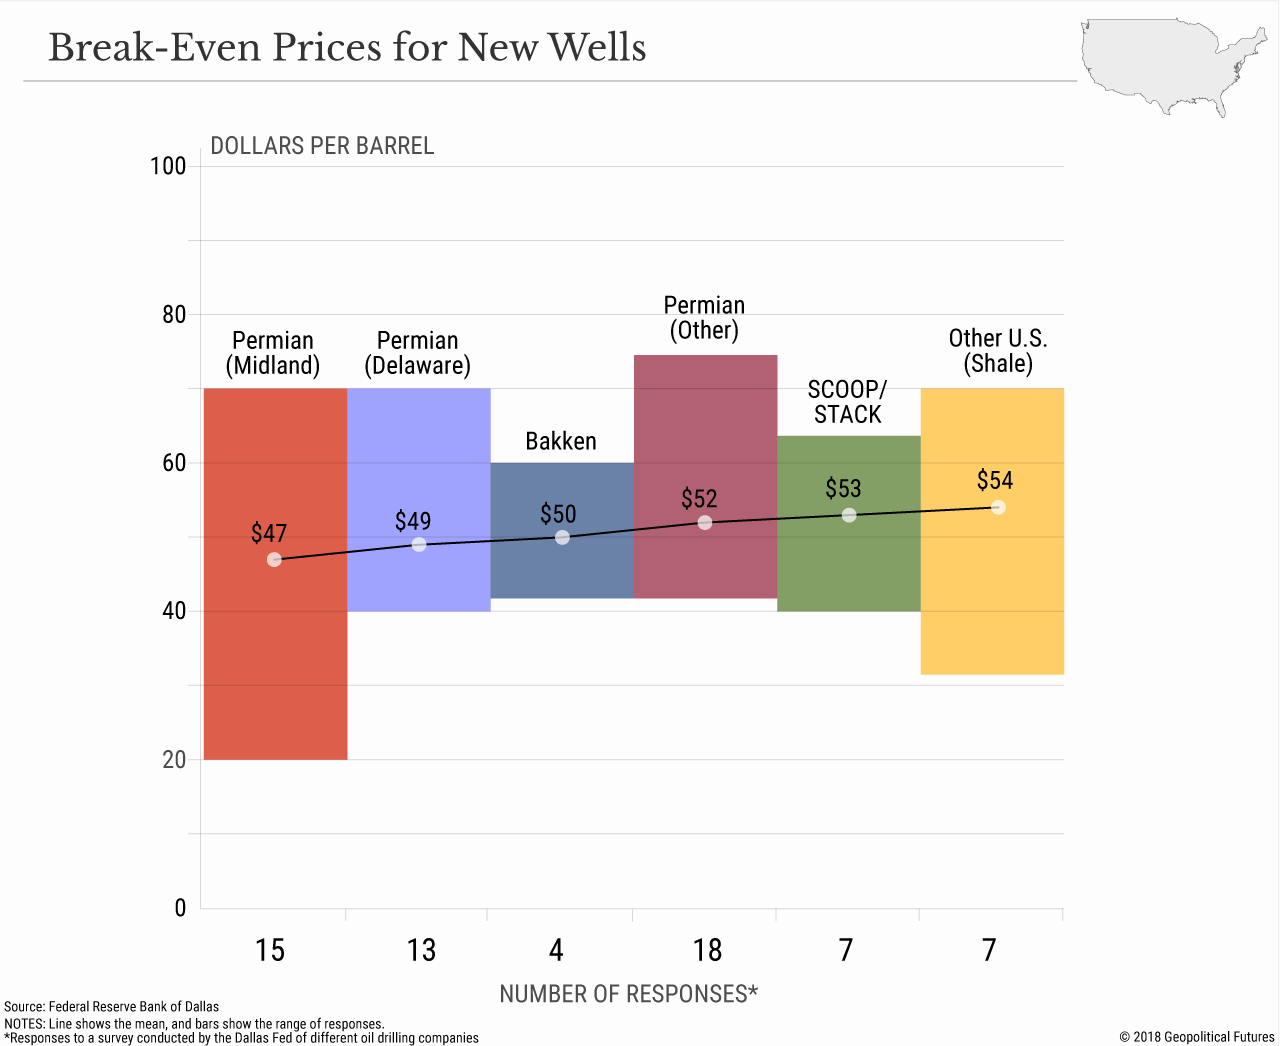 The Crude Math of Geopolitical Risk | Geopolitical Futures